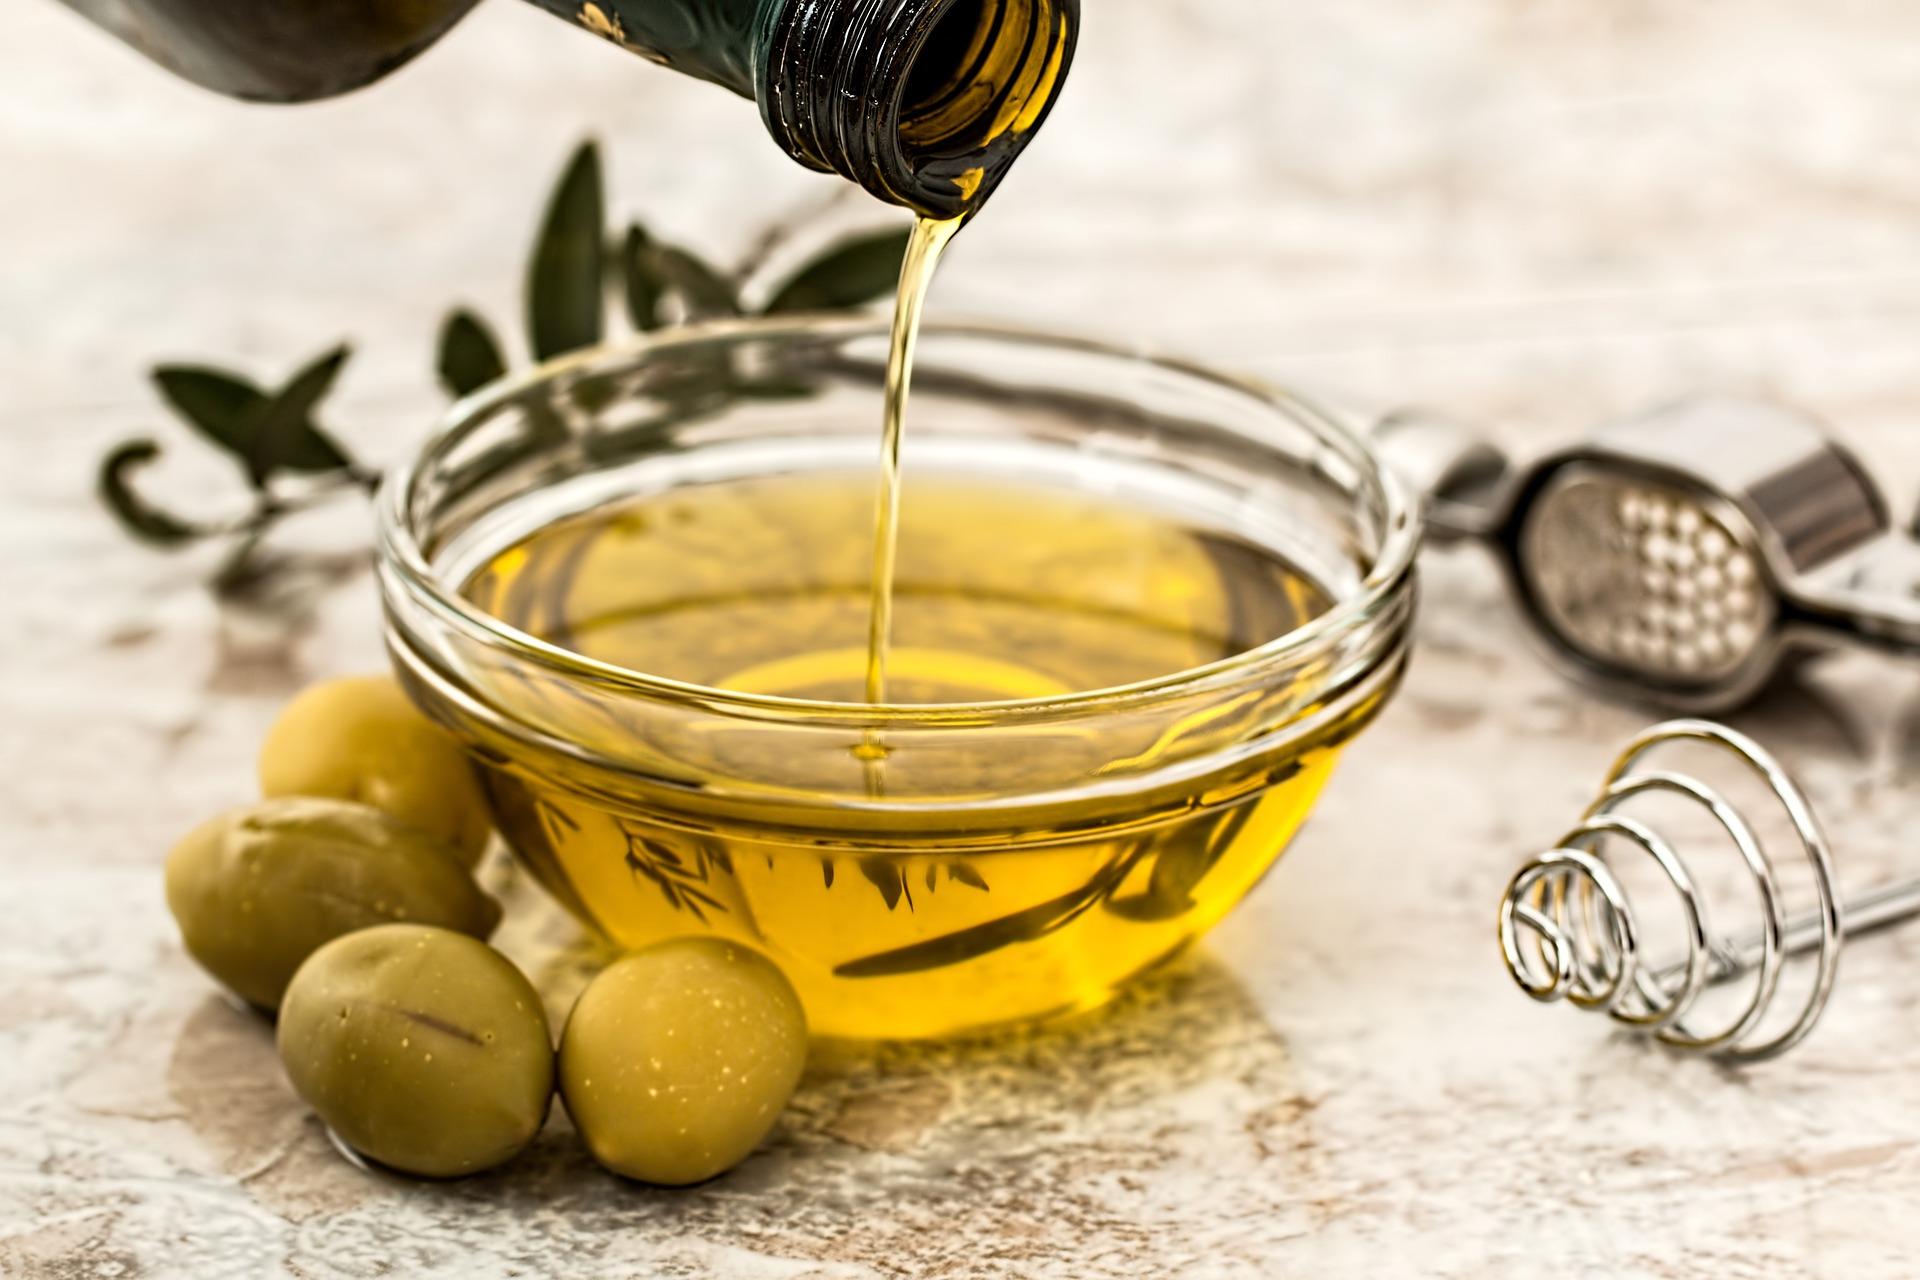 Bienfaits des olives